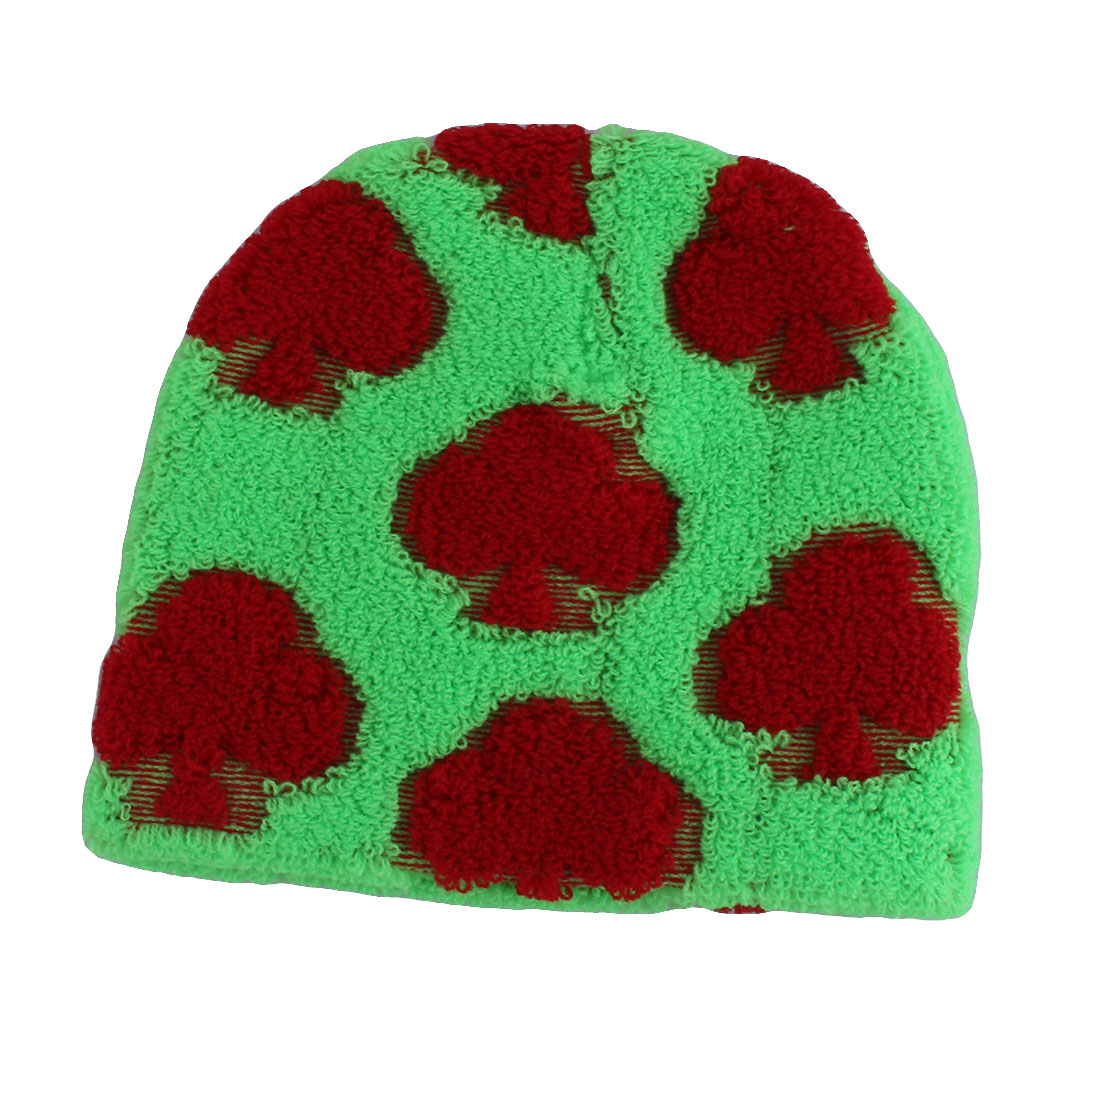 Bathroom Women Flower Pattern Elastic Band Bathing Hat Shower Cap Green Red